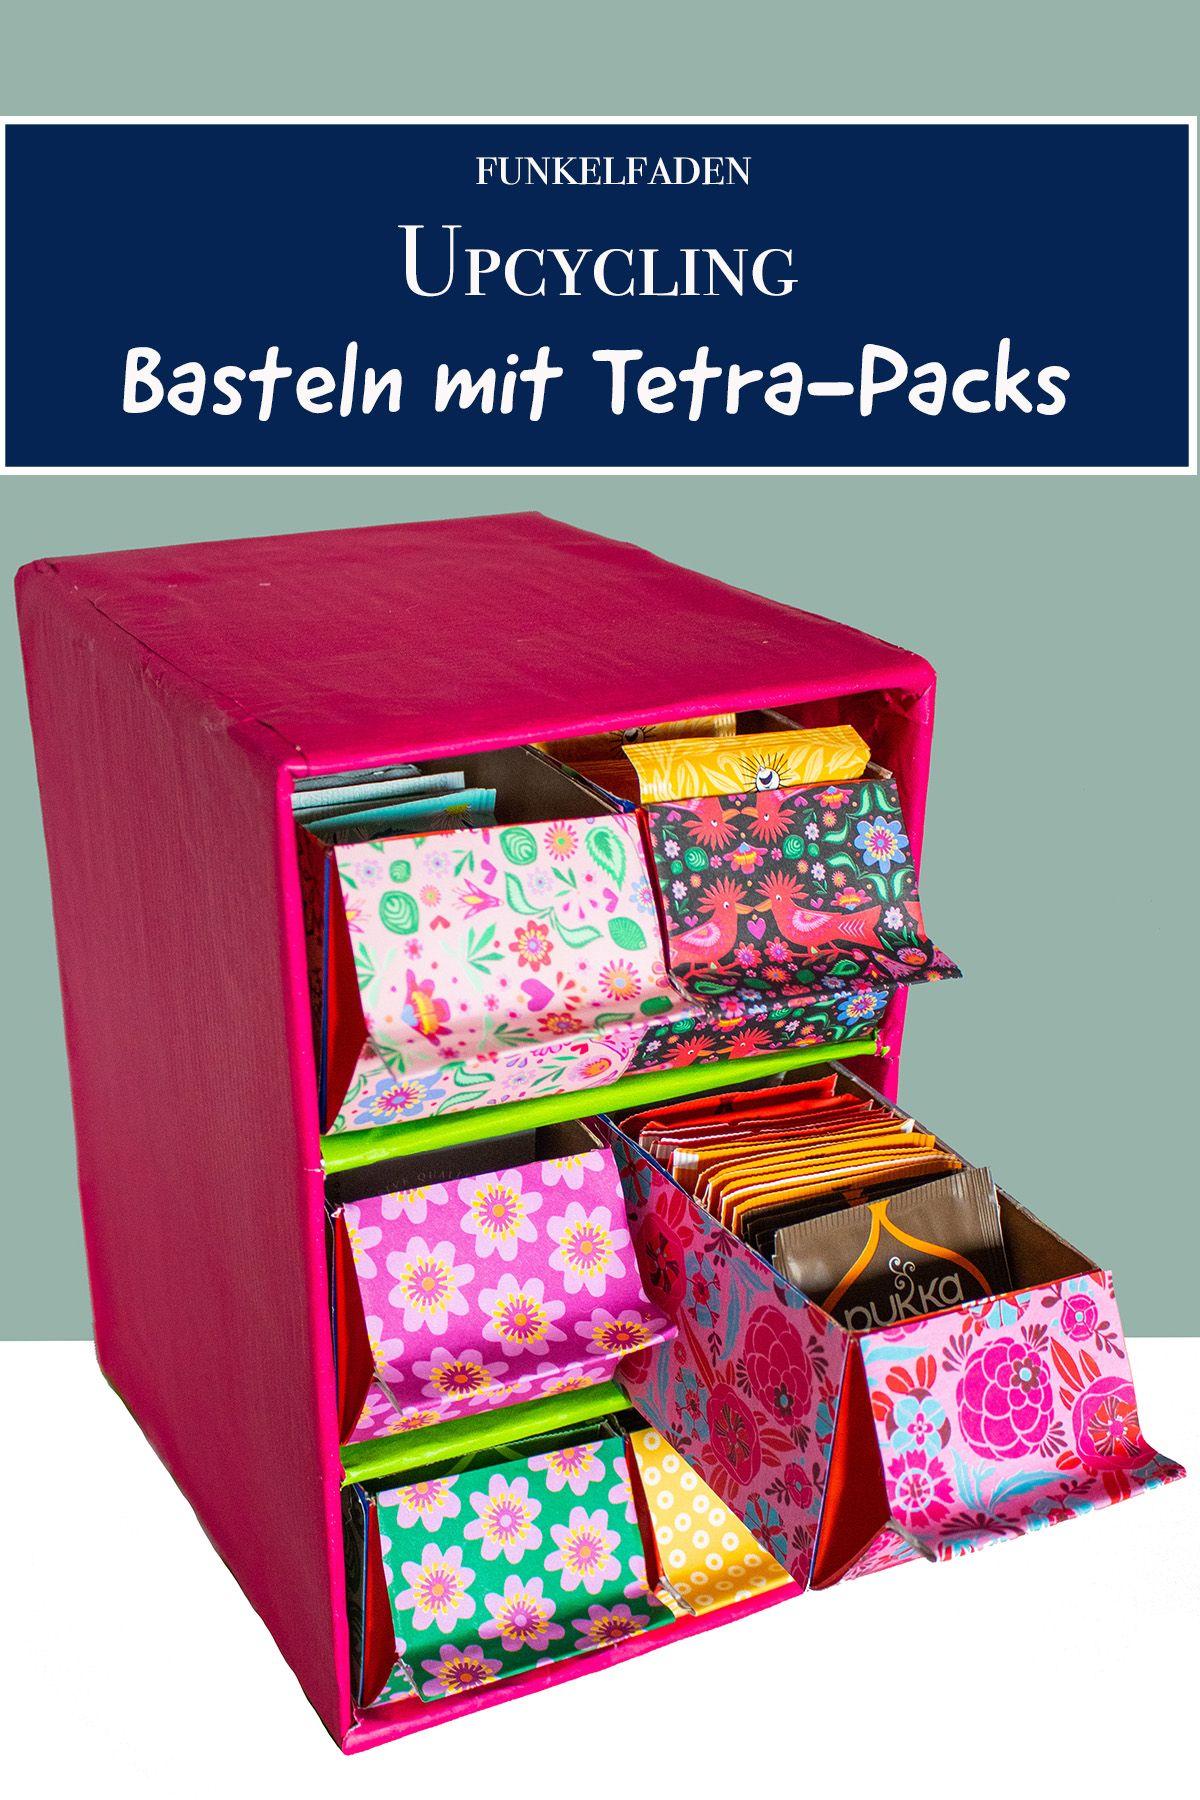 Upcycling - DIY Anleitung Regal aus Tetra-Packs und Kartons basteln